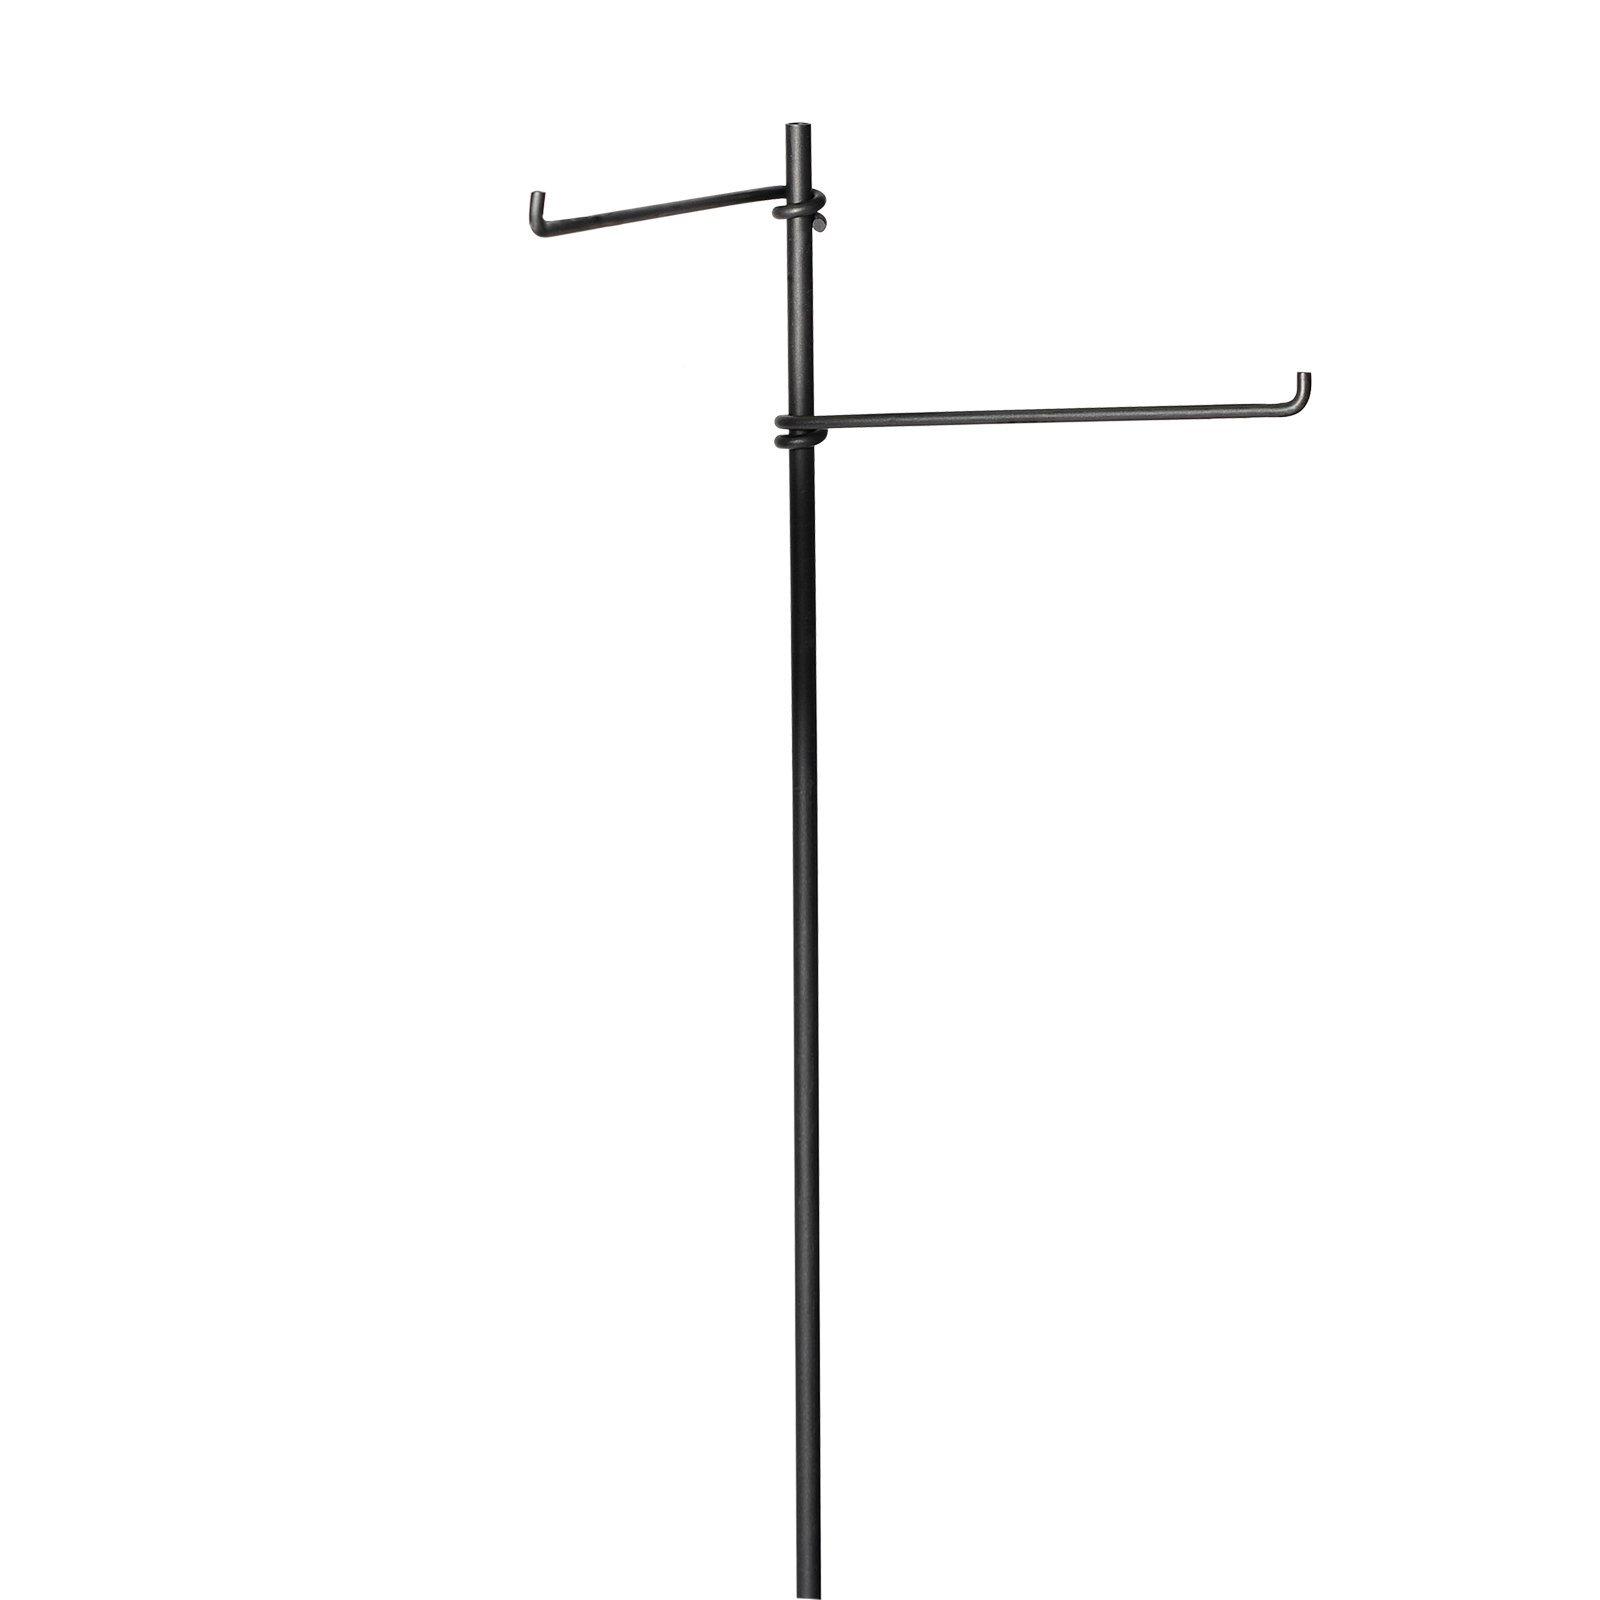 Wooshka Utensil / Accessory Stand